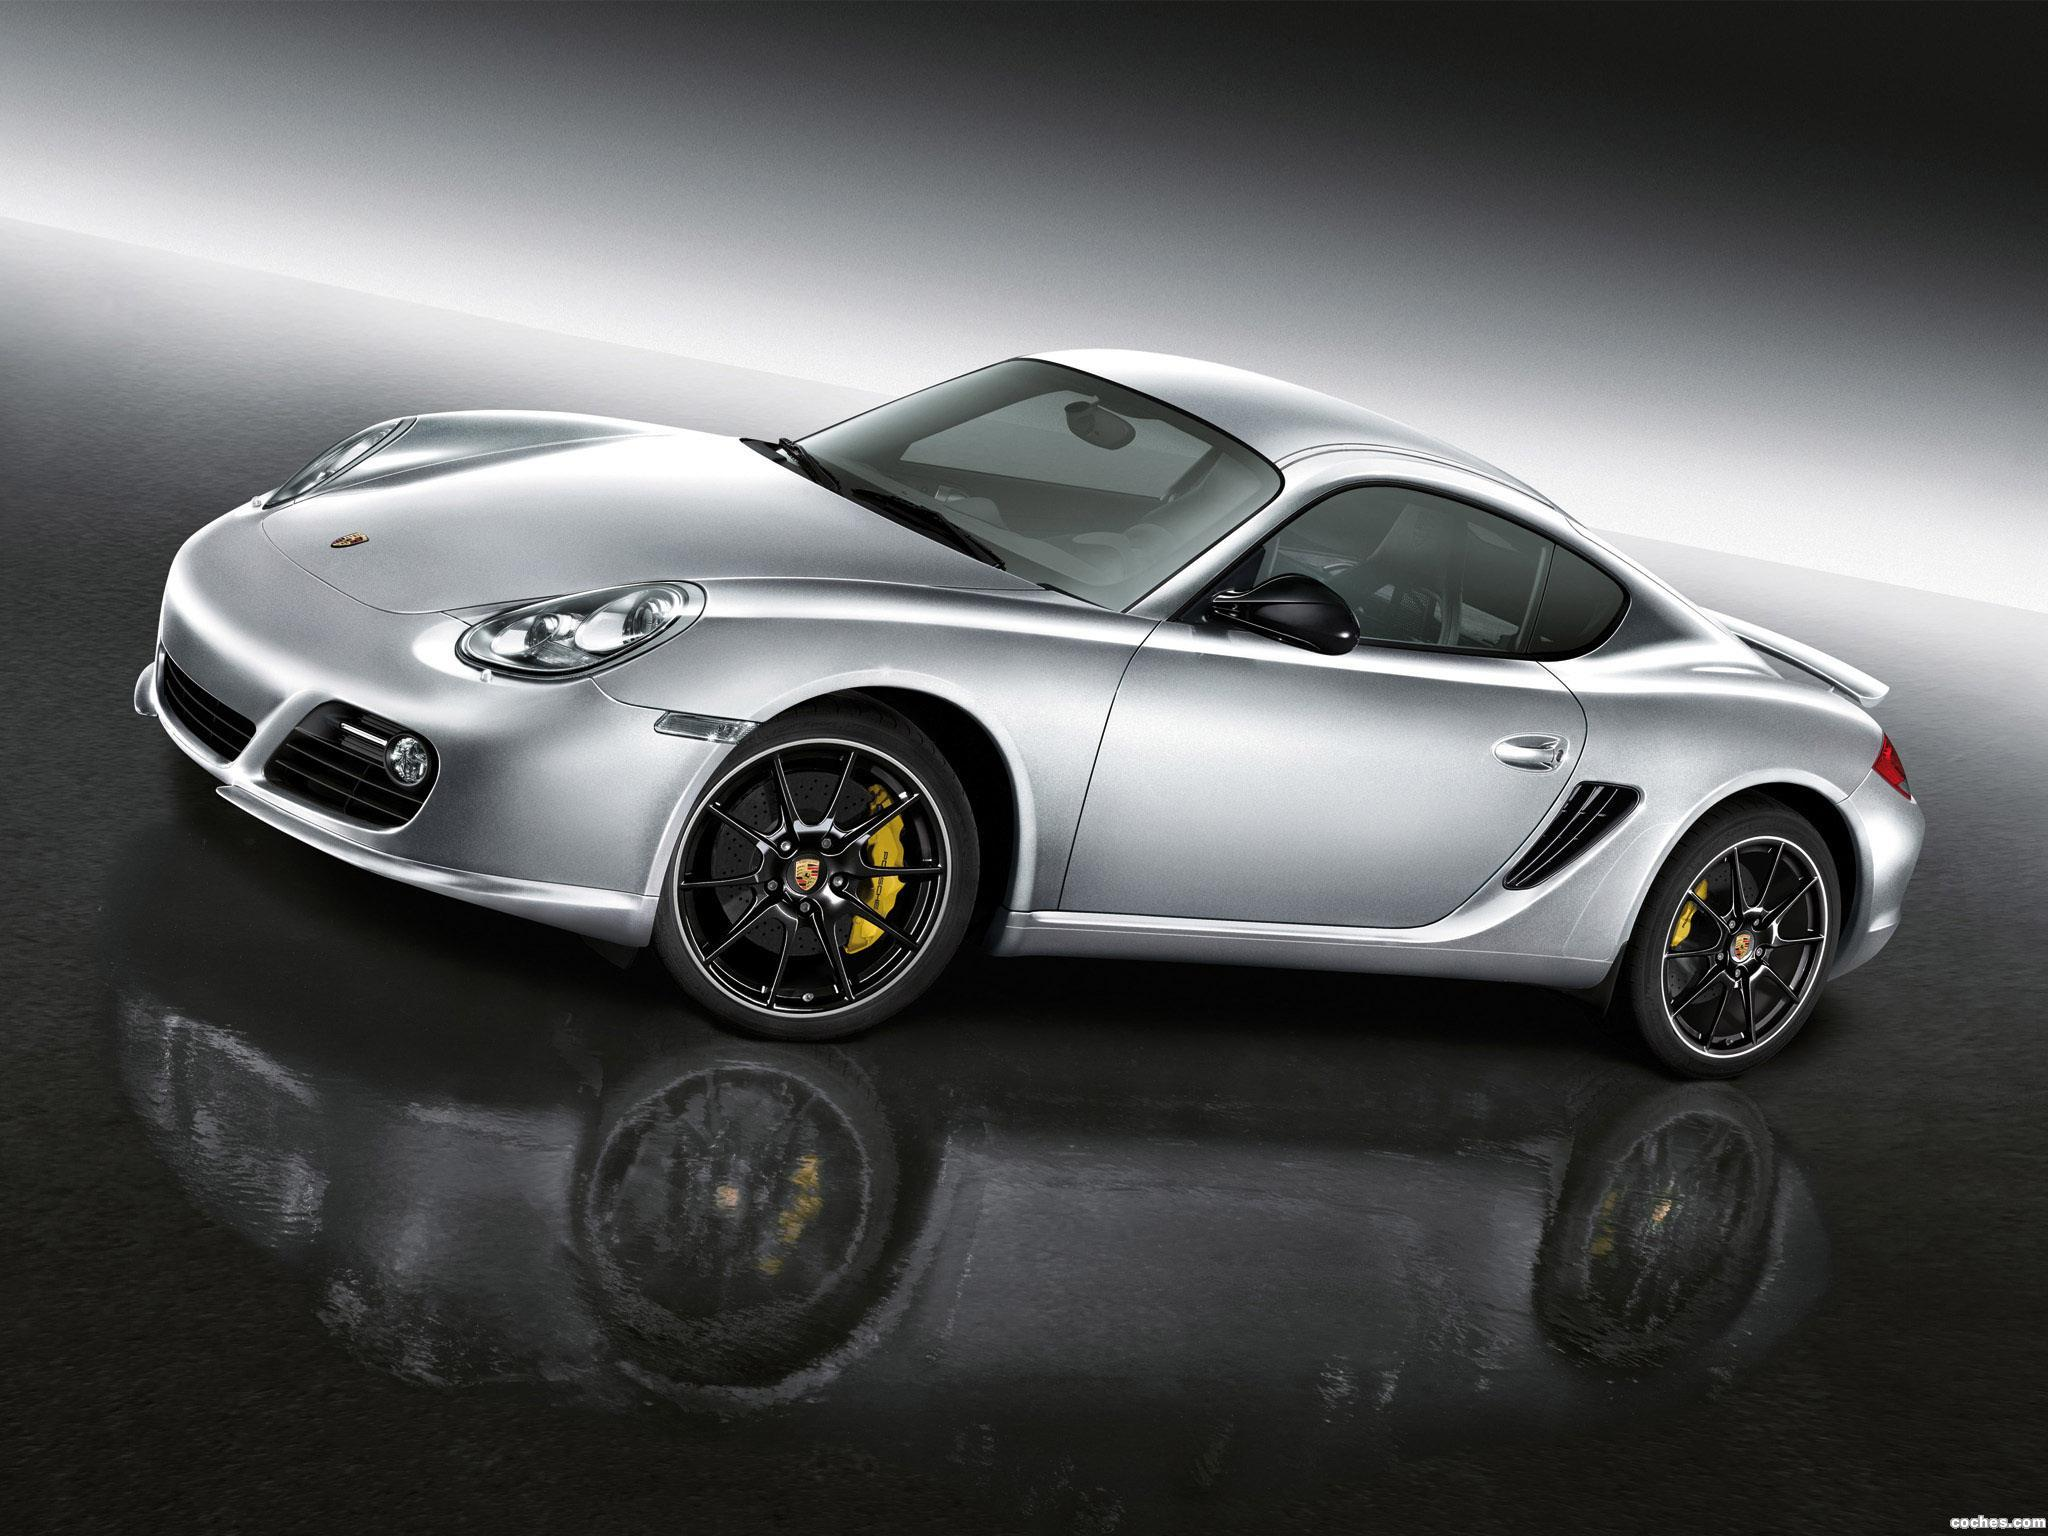 Foto 1 de Porsche Cayman SportDesign Package 987C 2010